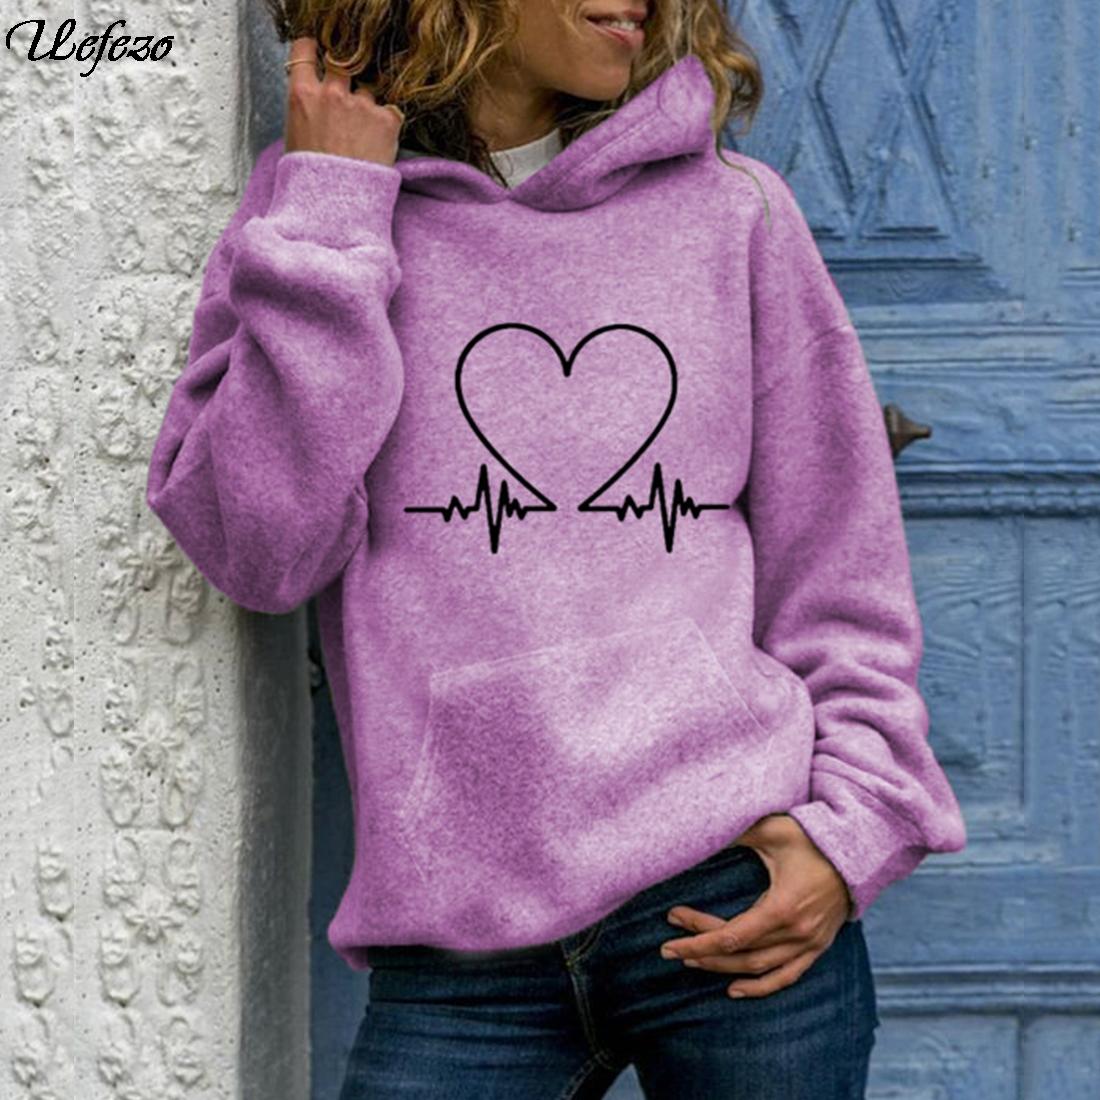 Uefezo Female Hoodies Women Oversized Sweatshirts Women's Gown with Long Sleeve Tops Casual Hooded Women Pocket Pullovers